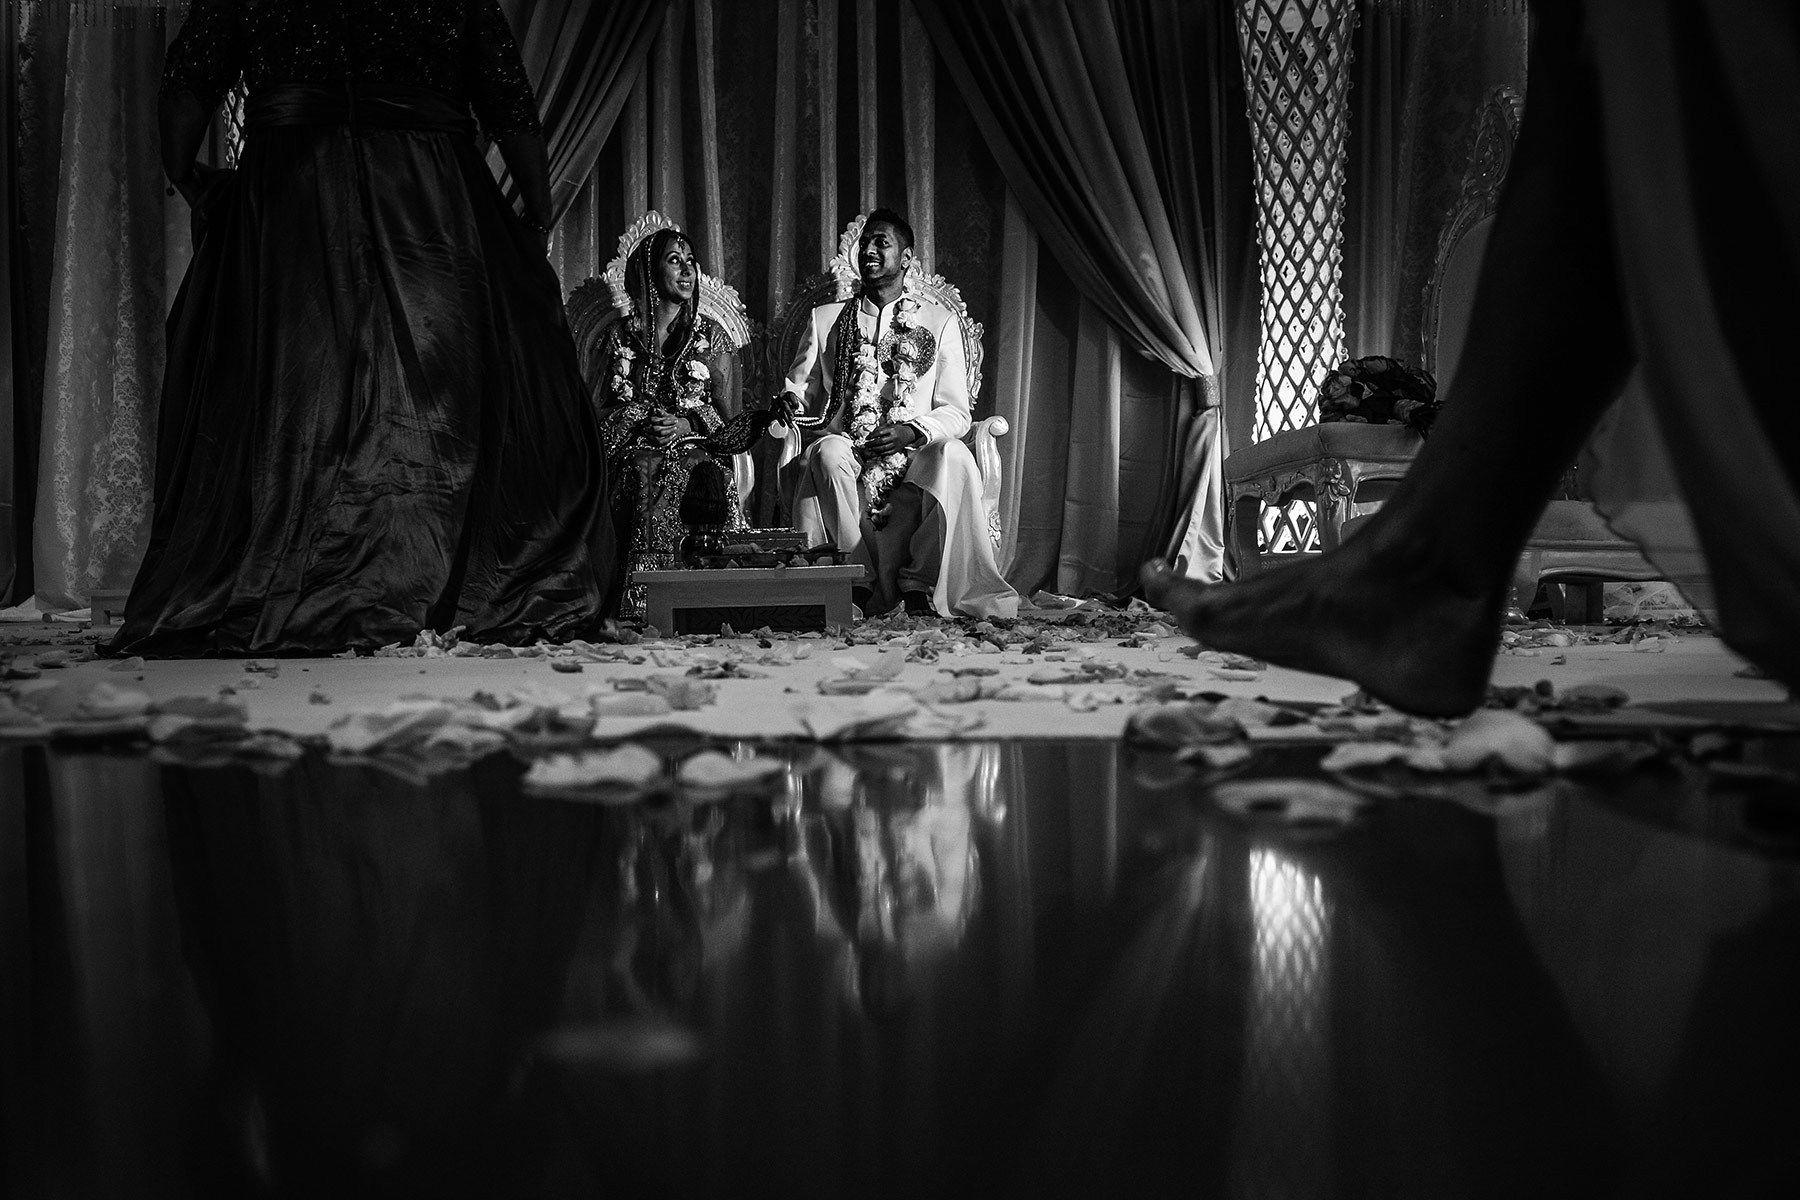 Montreal hindu wedding ceremony, bride and groom together